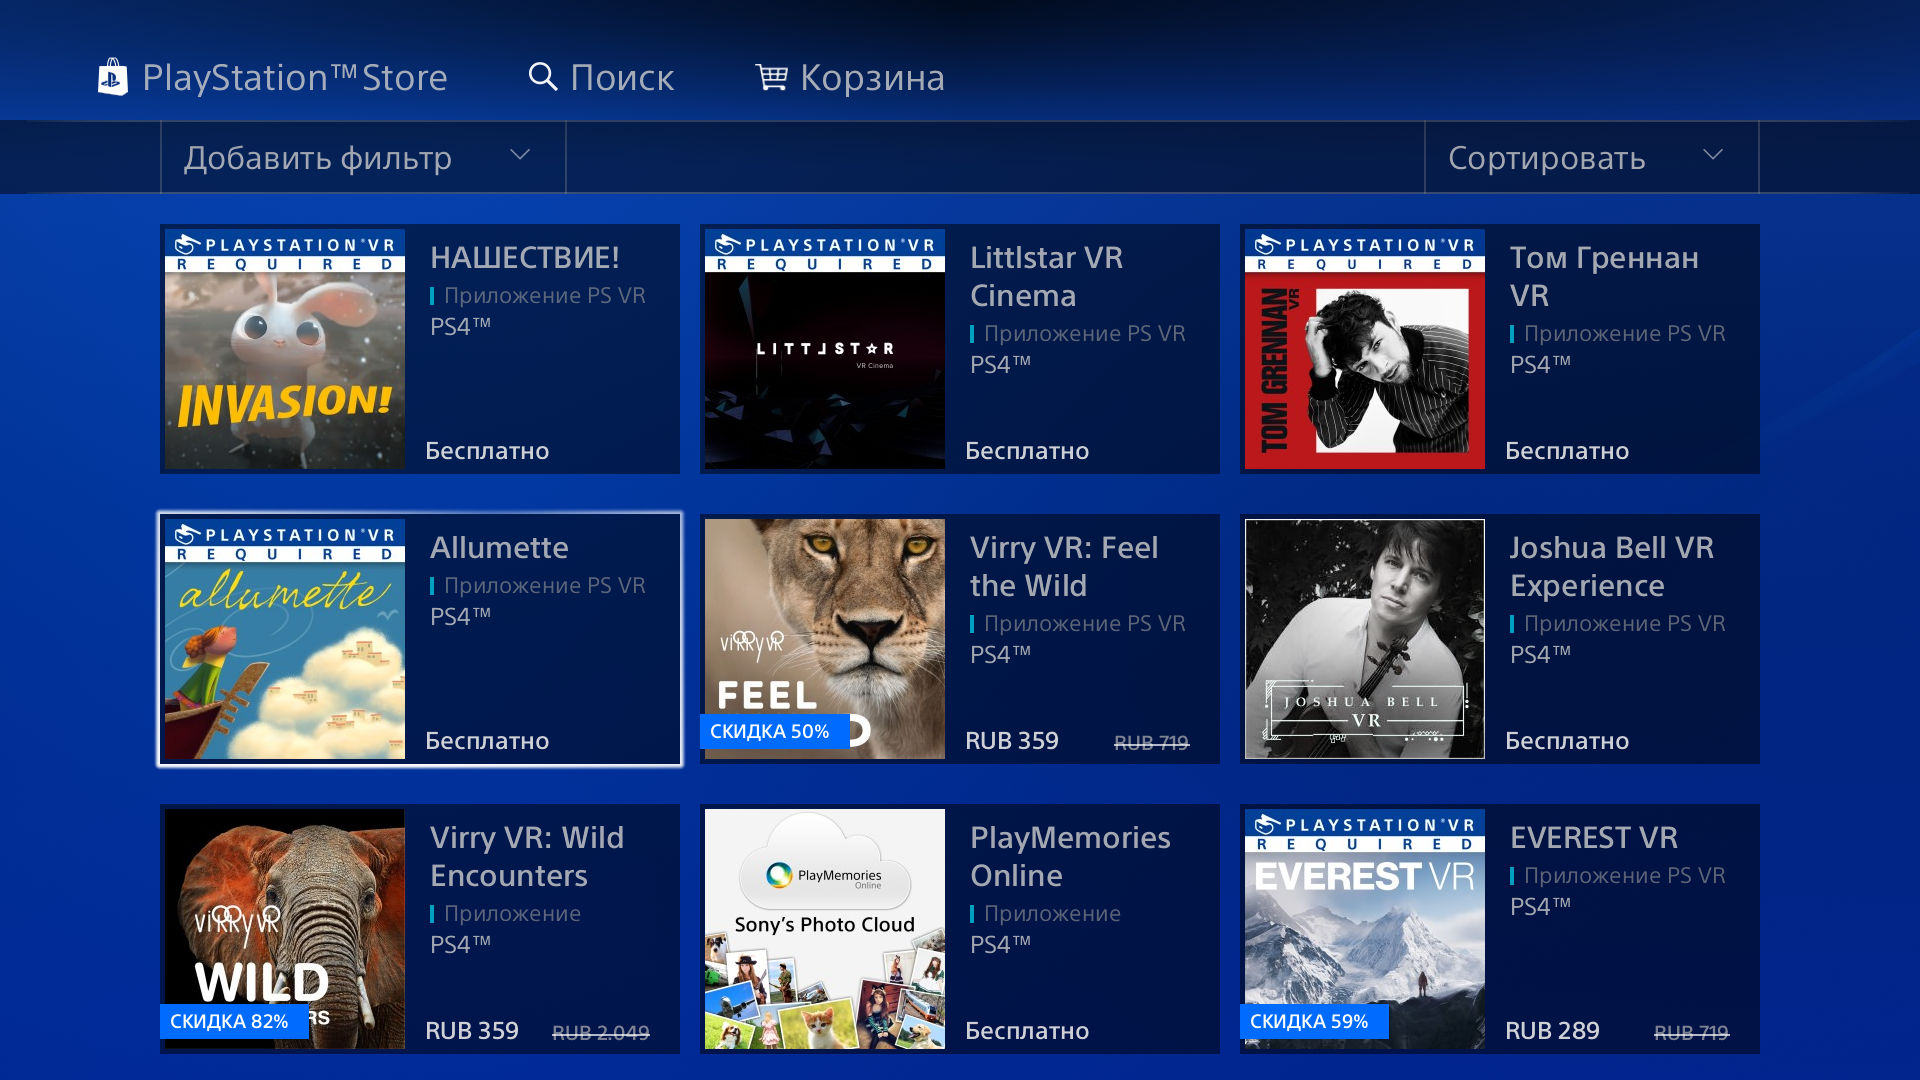 Sony PlayStation 4 и PlayStation 4 Pro / Neo (PS4) FAQ в